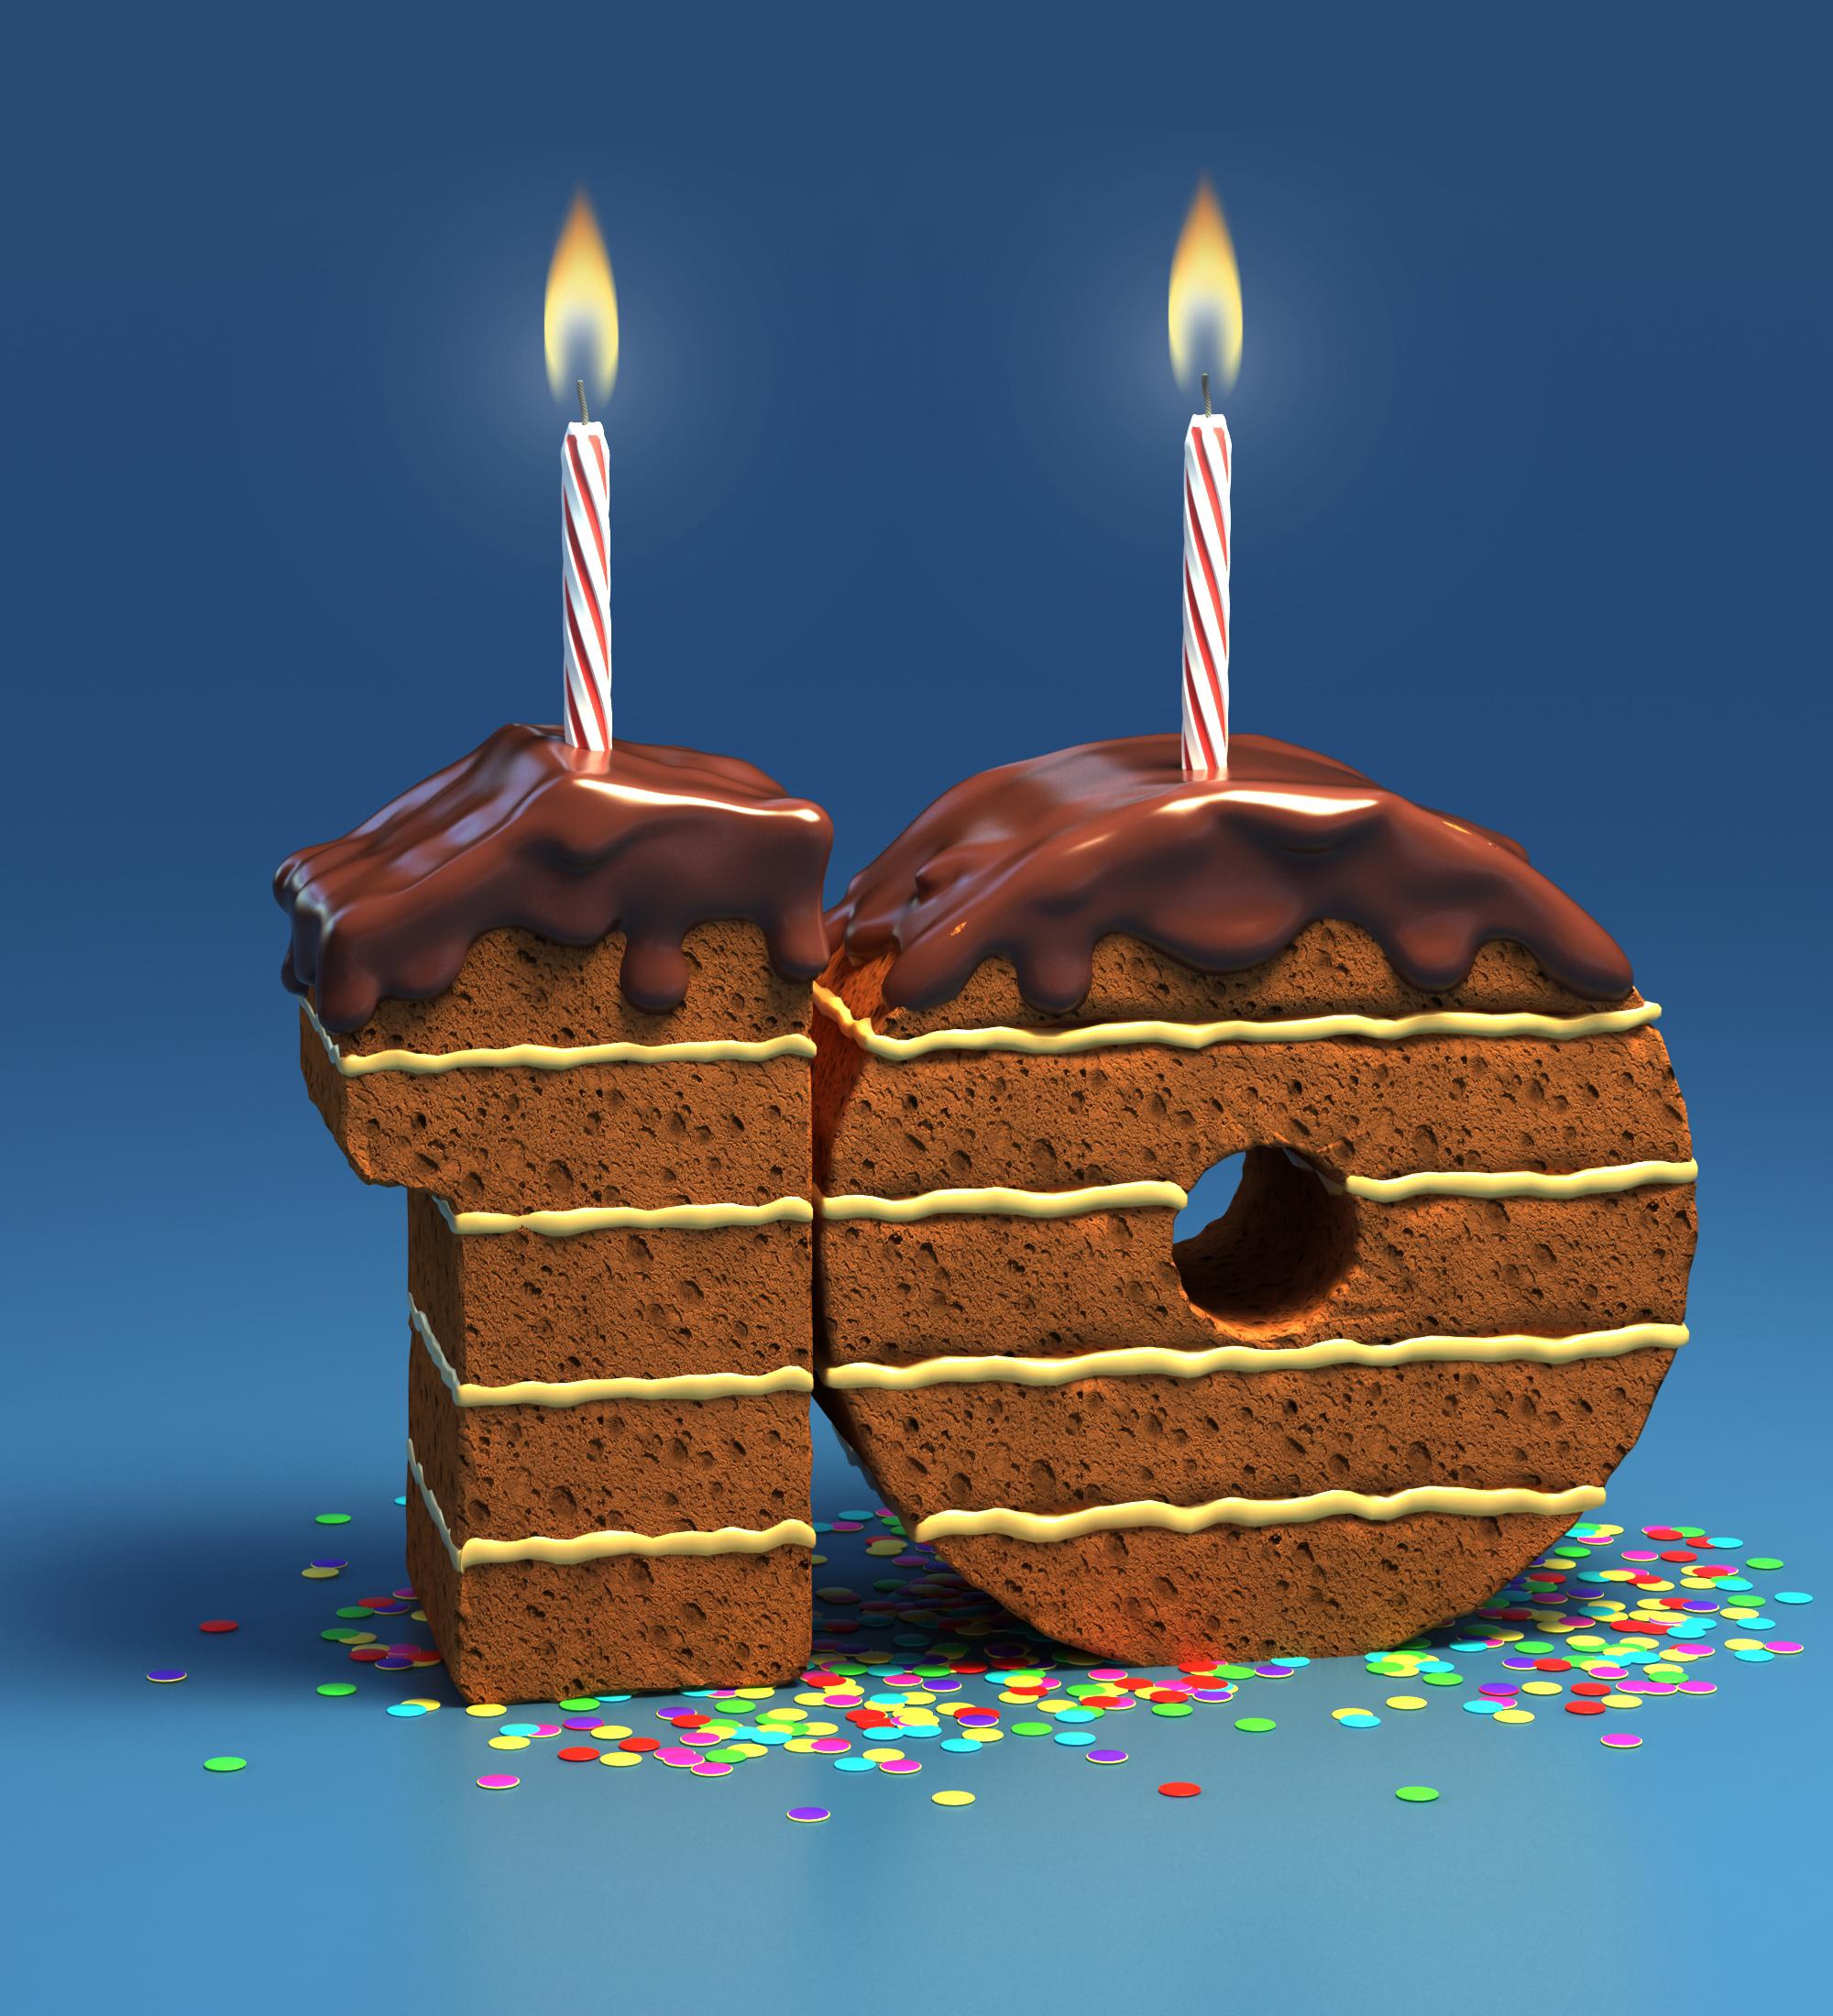 https://depositphotos.com/9516817/stock-photo-chocolate-birthday-cake.html